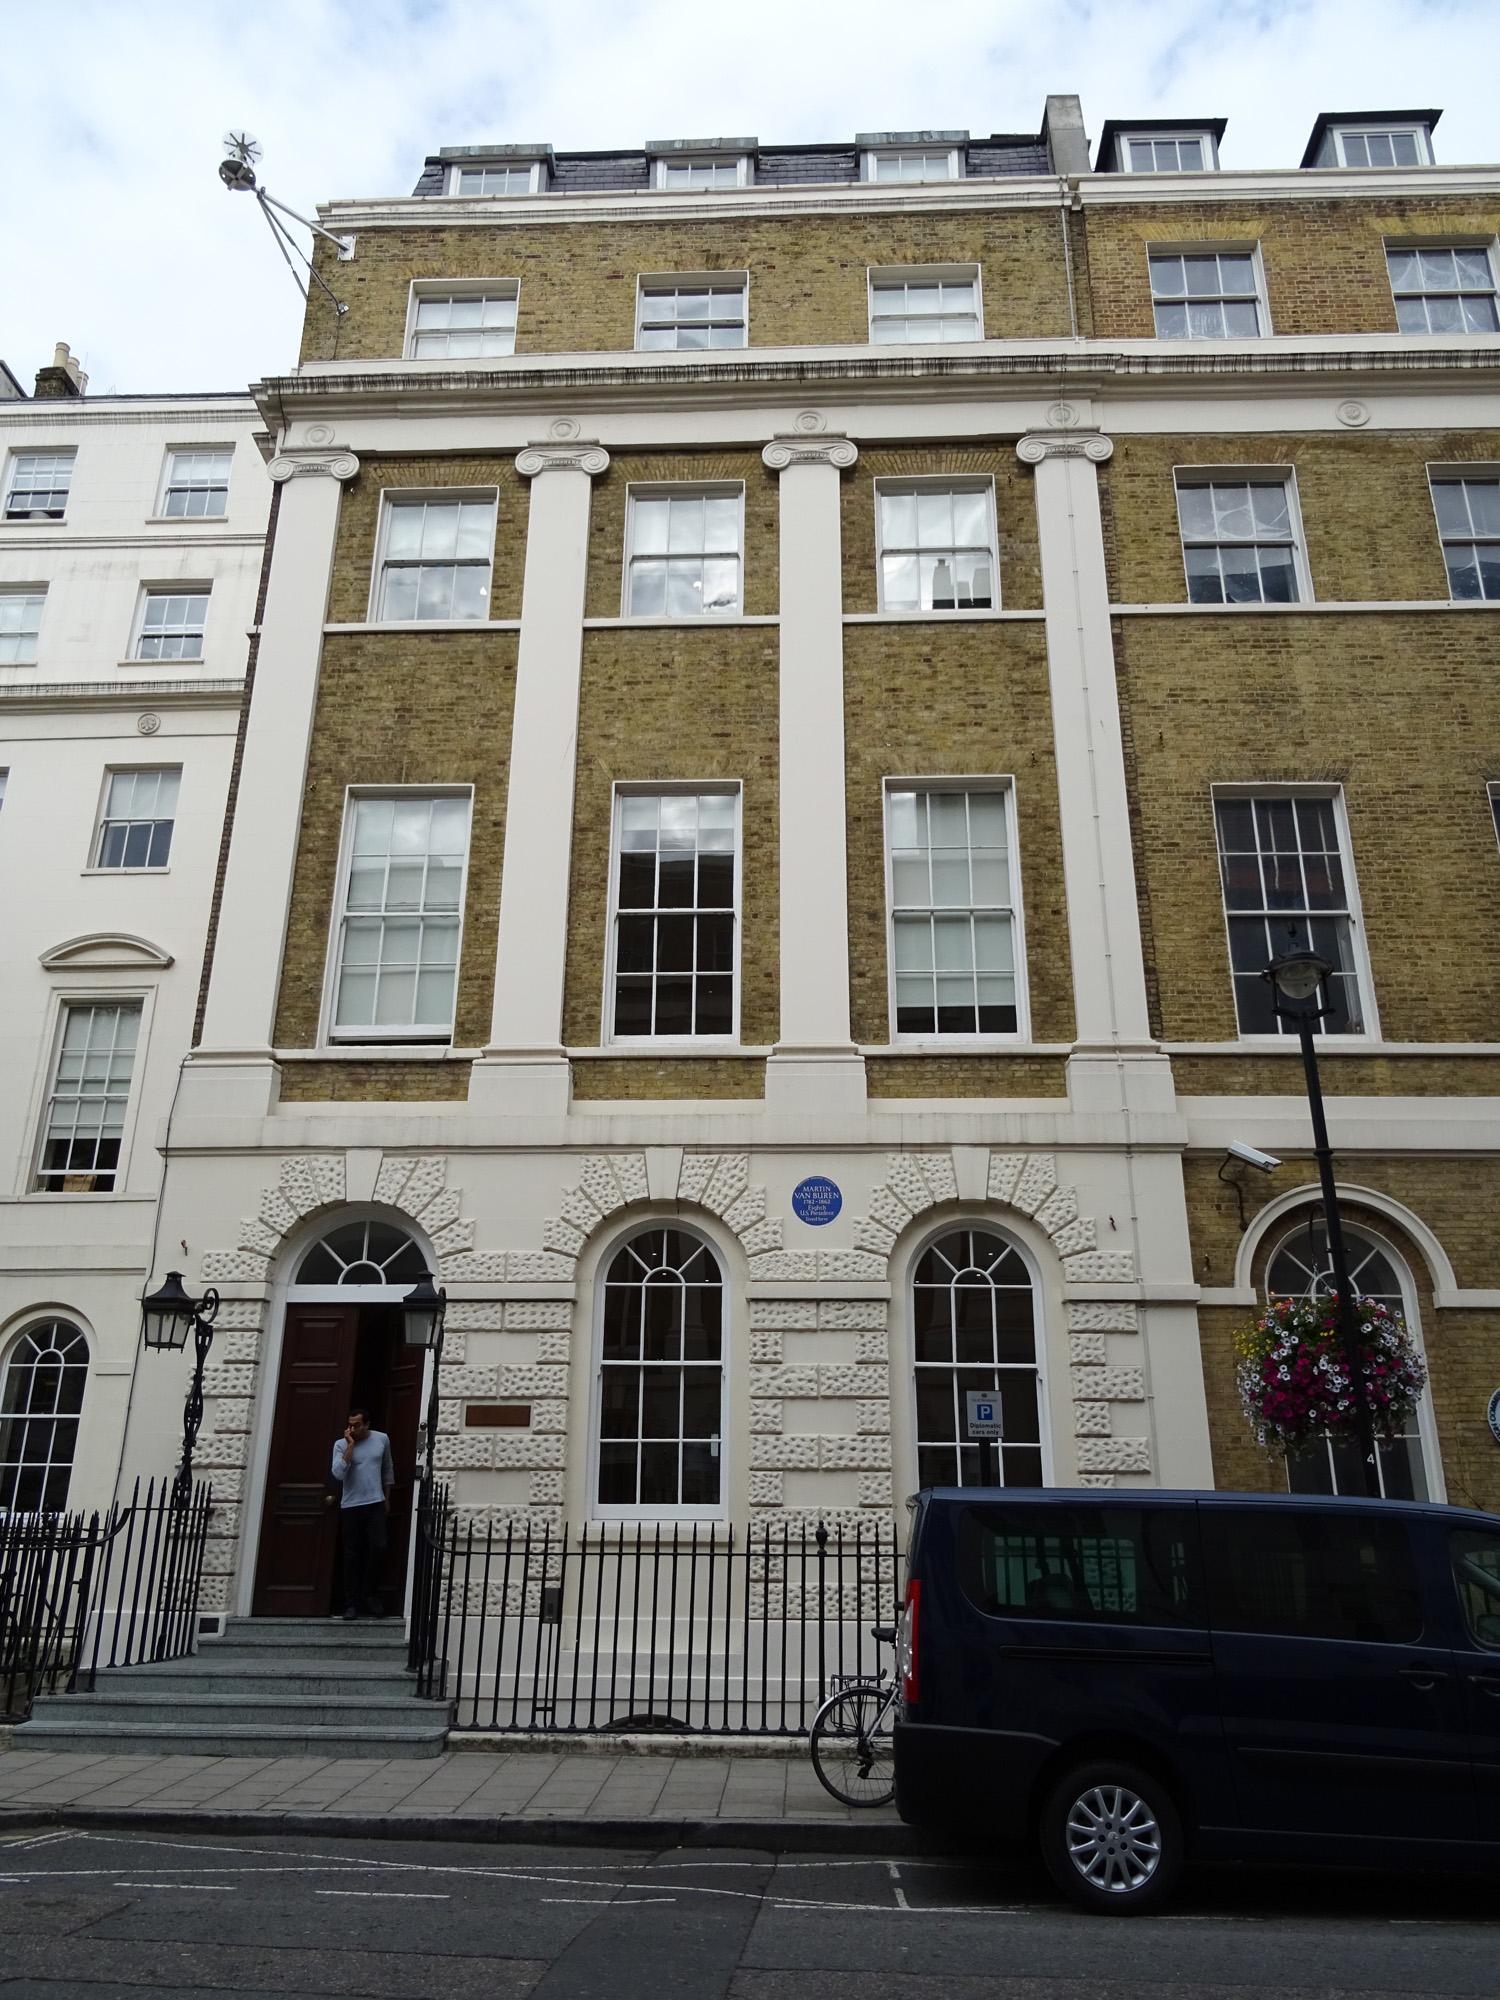 File Martin Van Buren 7 Stratford Place Marylebone London W1c 1ay Jpg Wikimedia Commons